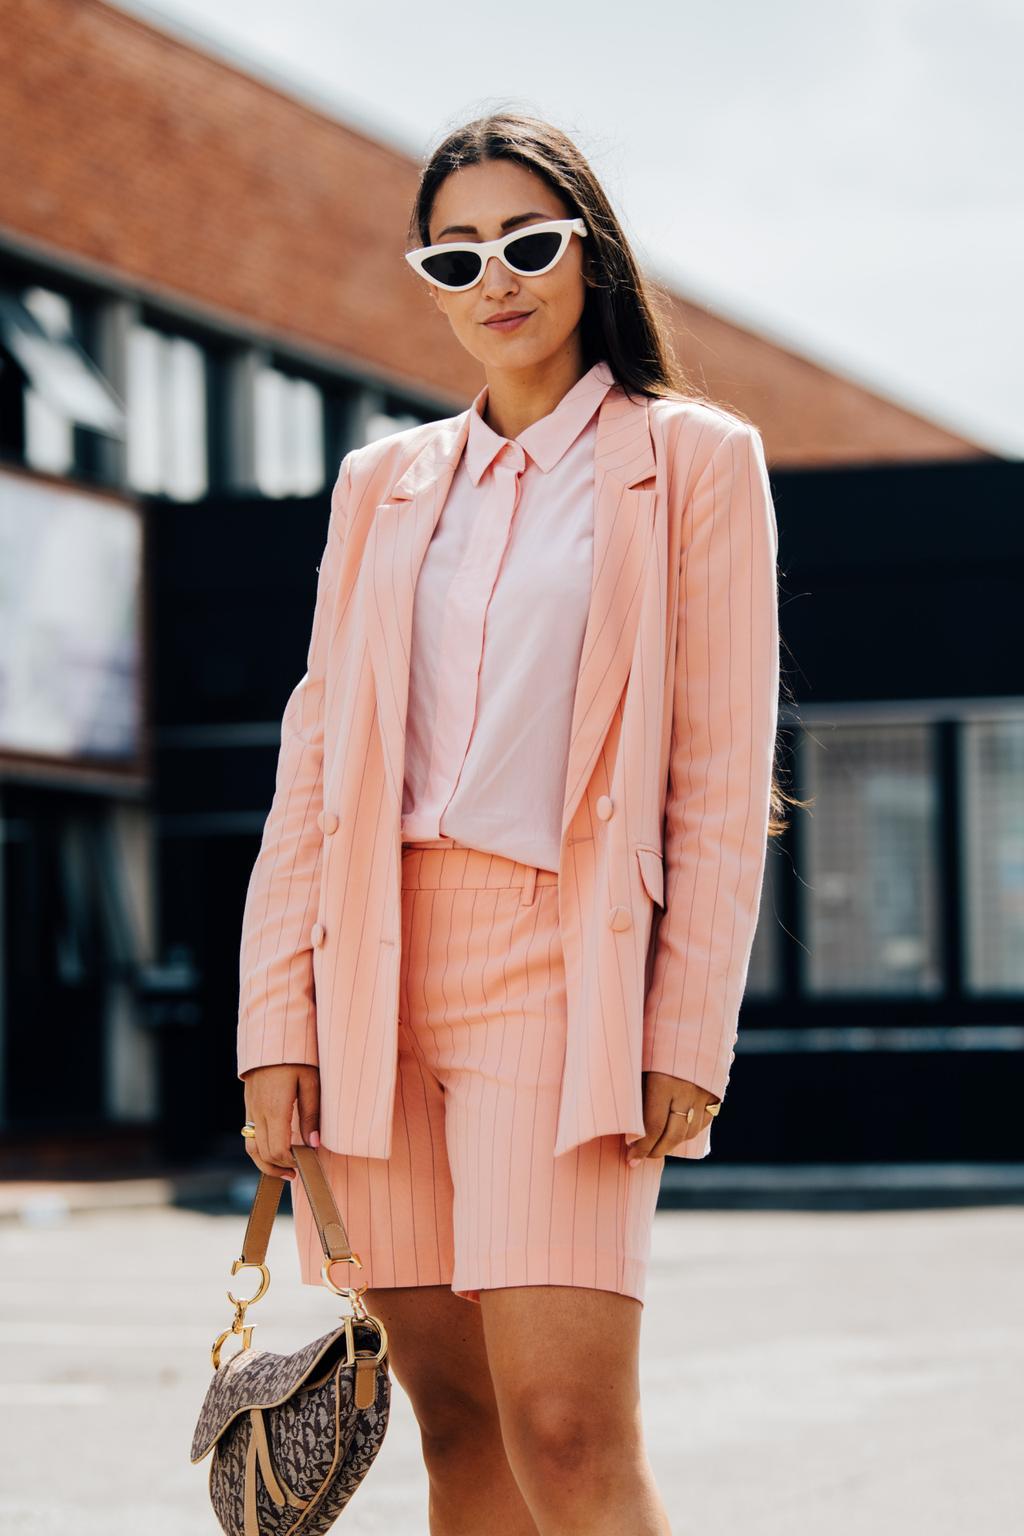 quần bermuda bộ suit hồng kẻ sọc dọc